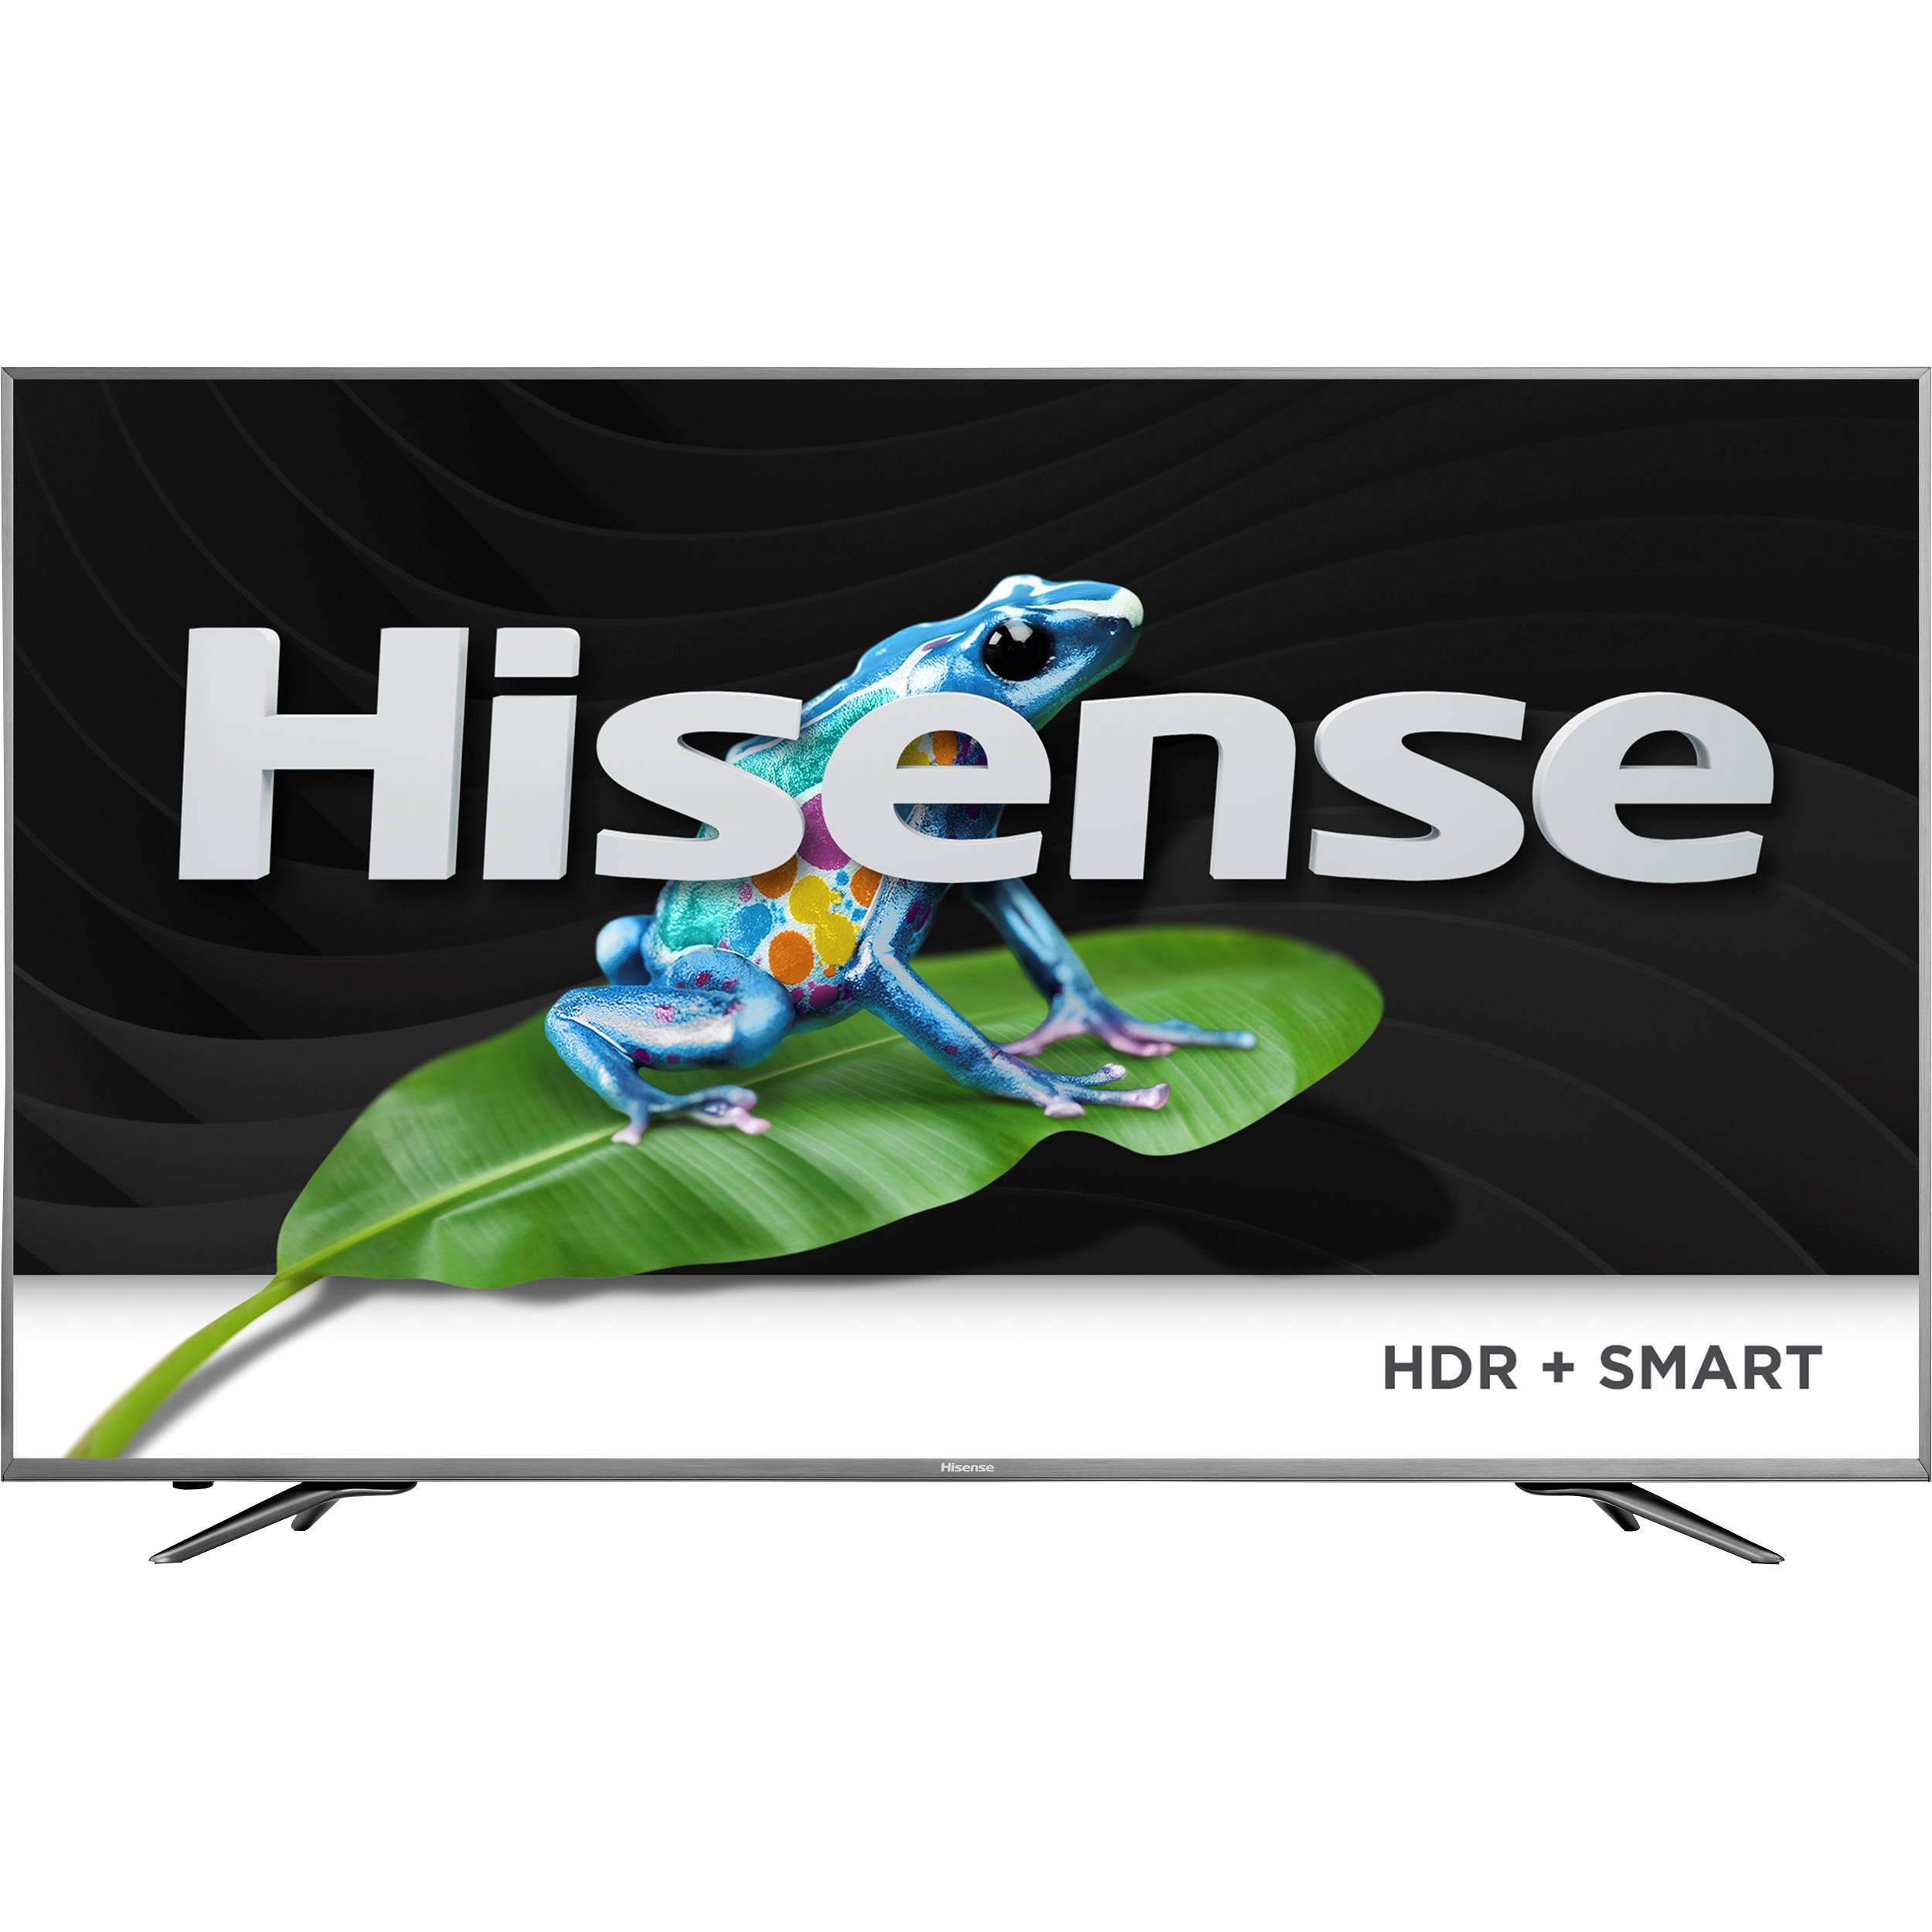 Used Hisense H9 Series 65 Class Hdr Uhd Smart Uled Tv